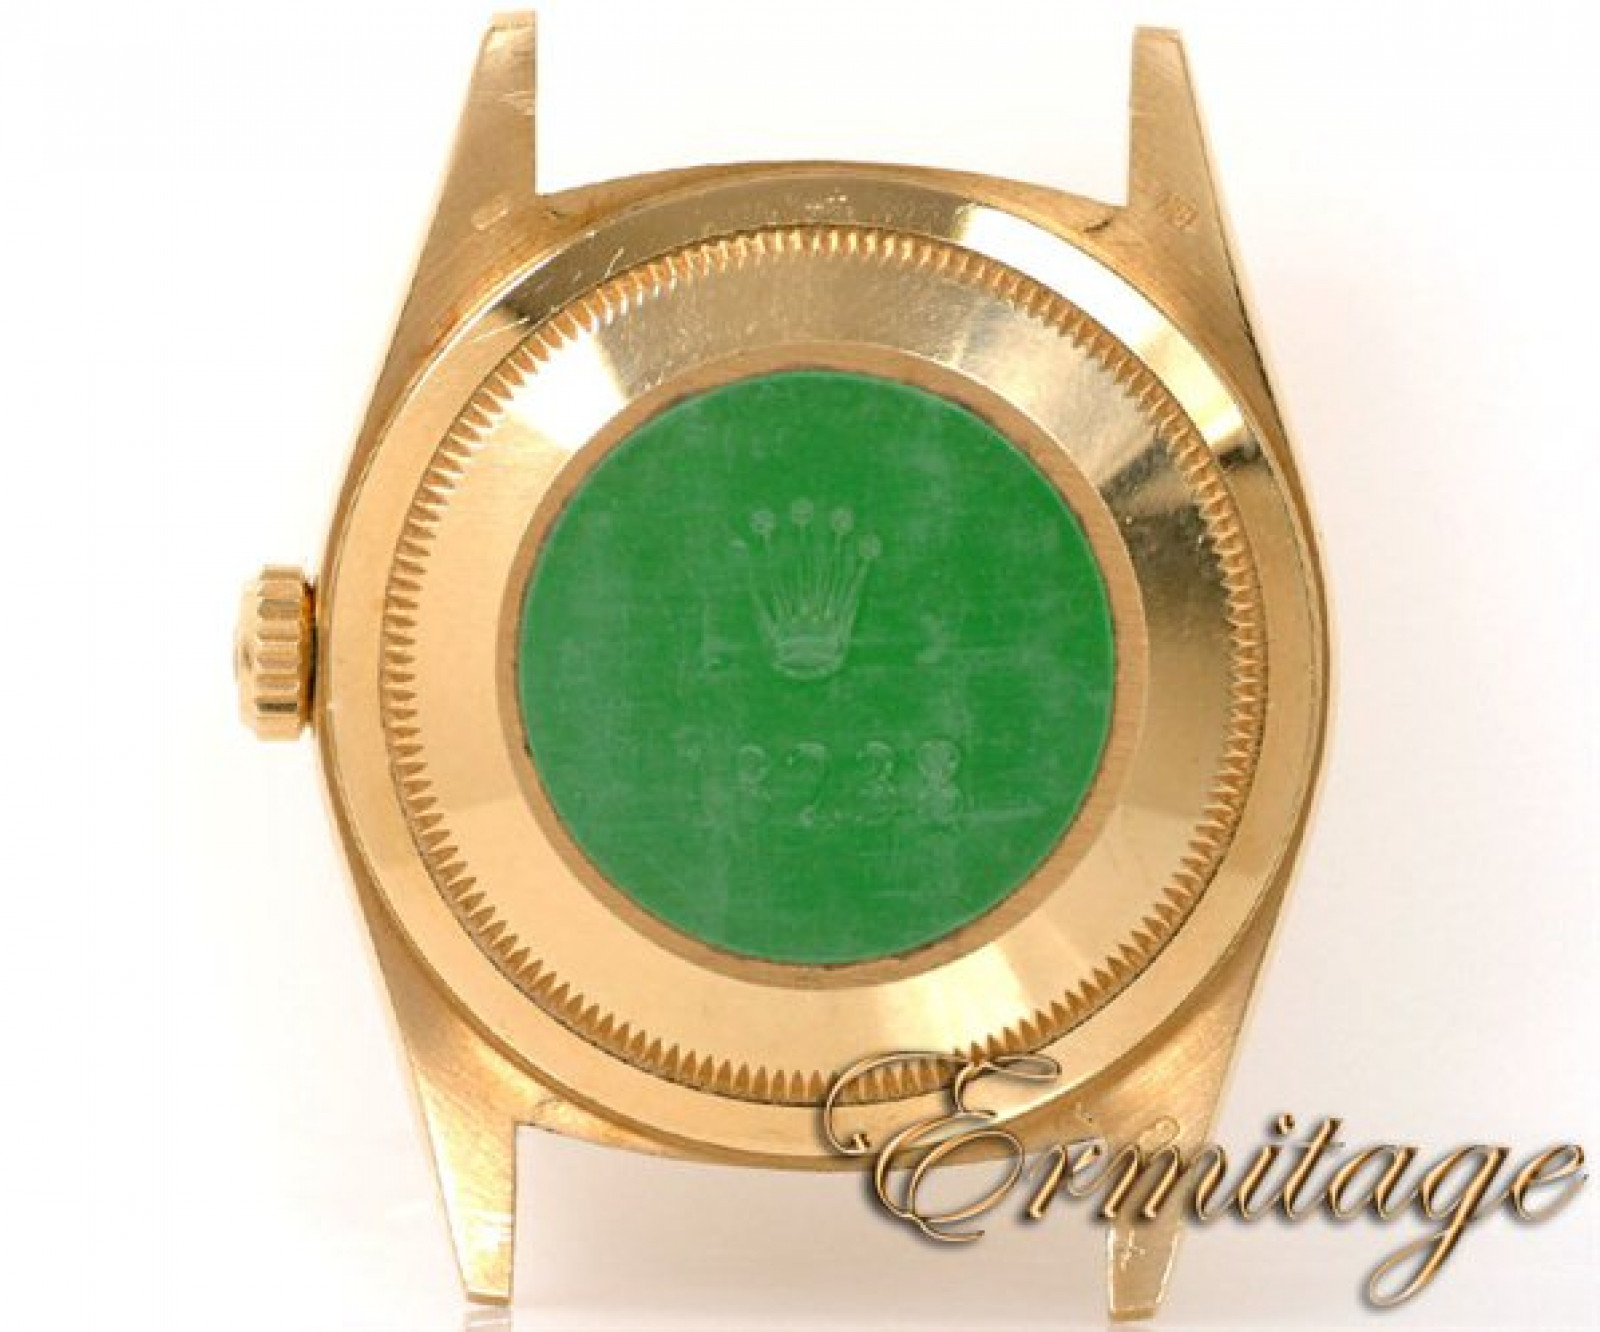 Rolex Day-Date 18238 Gold White 1999